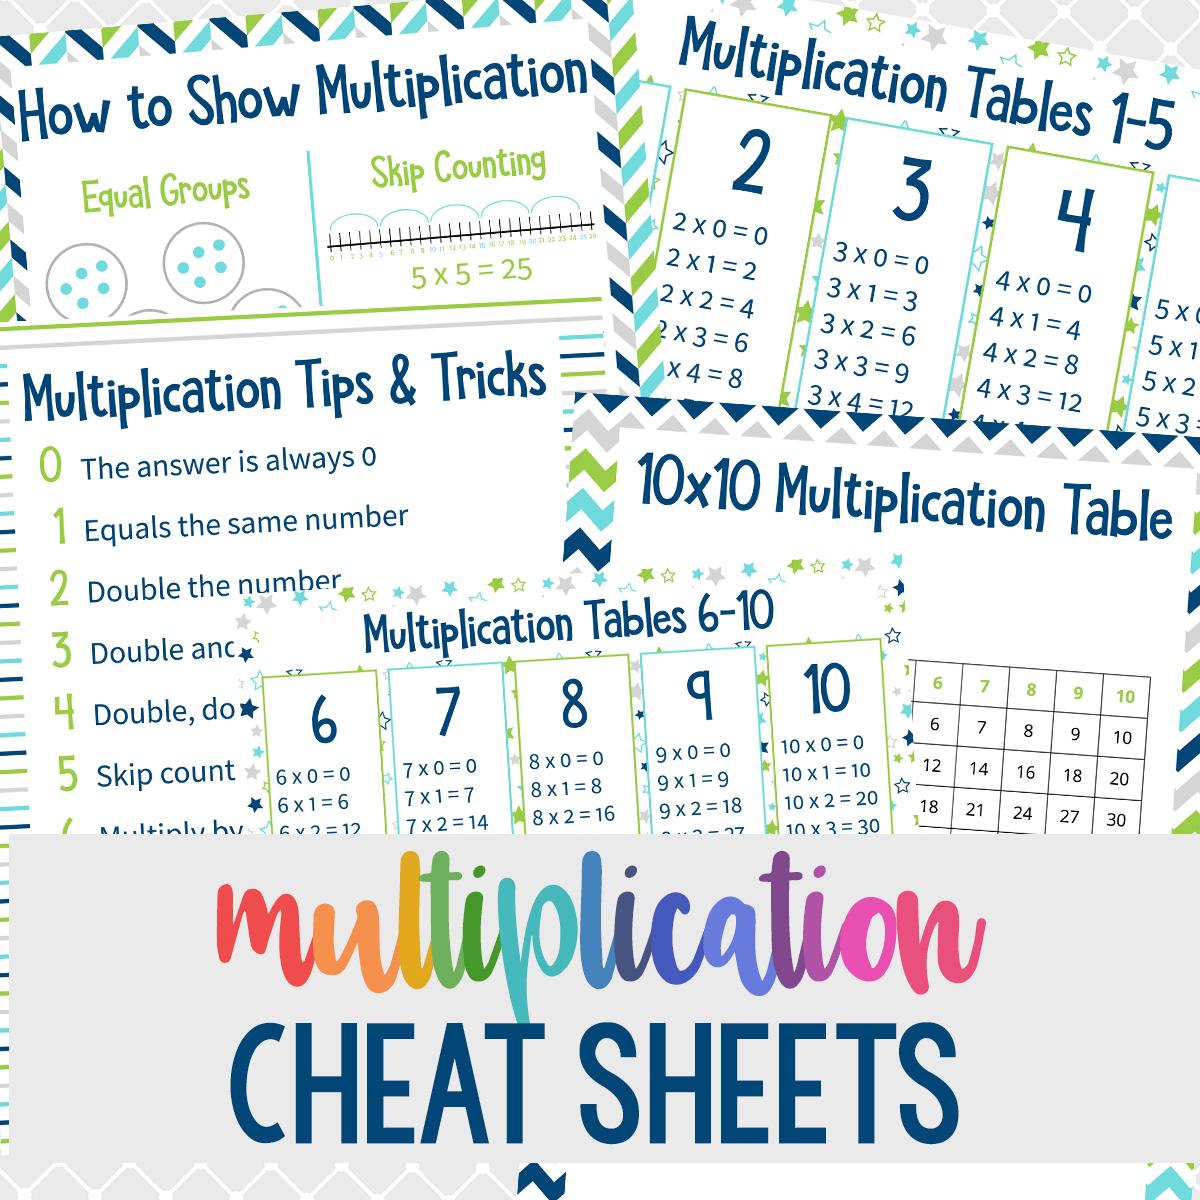 6 Multiplication Table Tricks